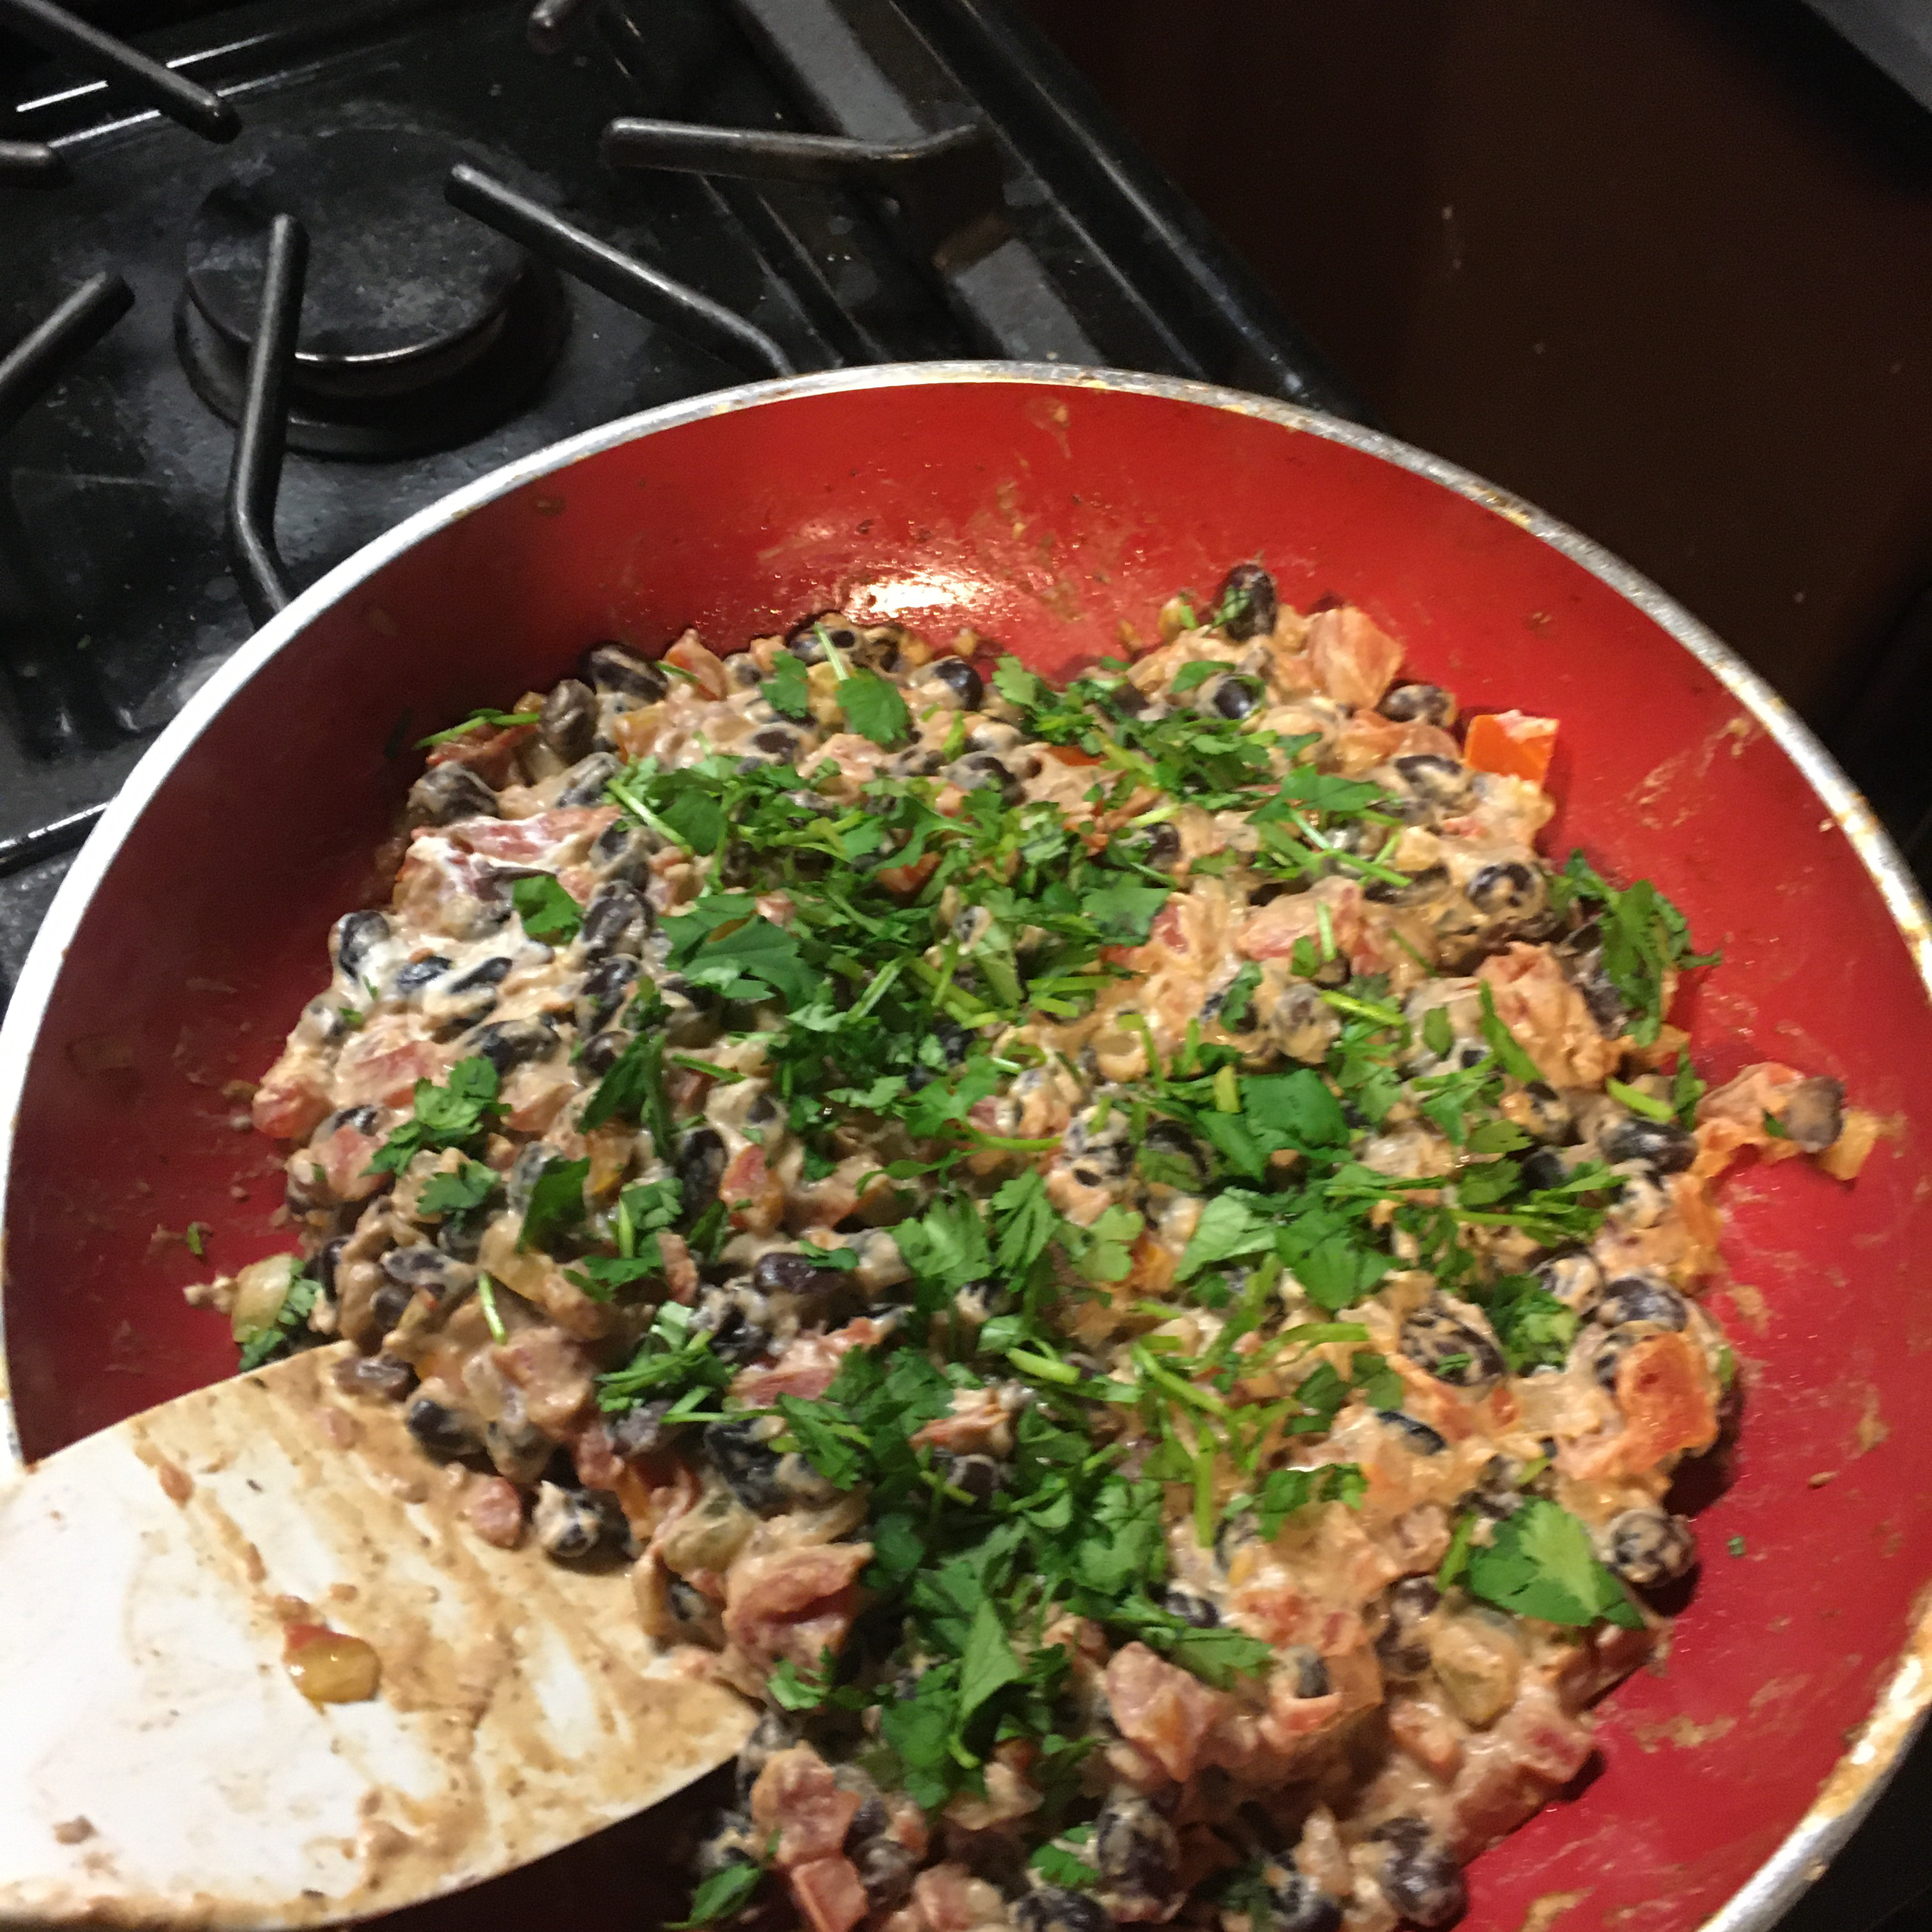 Delicious Black Bean Burritos Aaron Ferguson